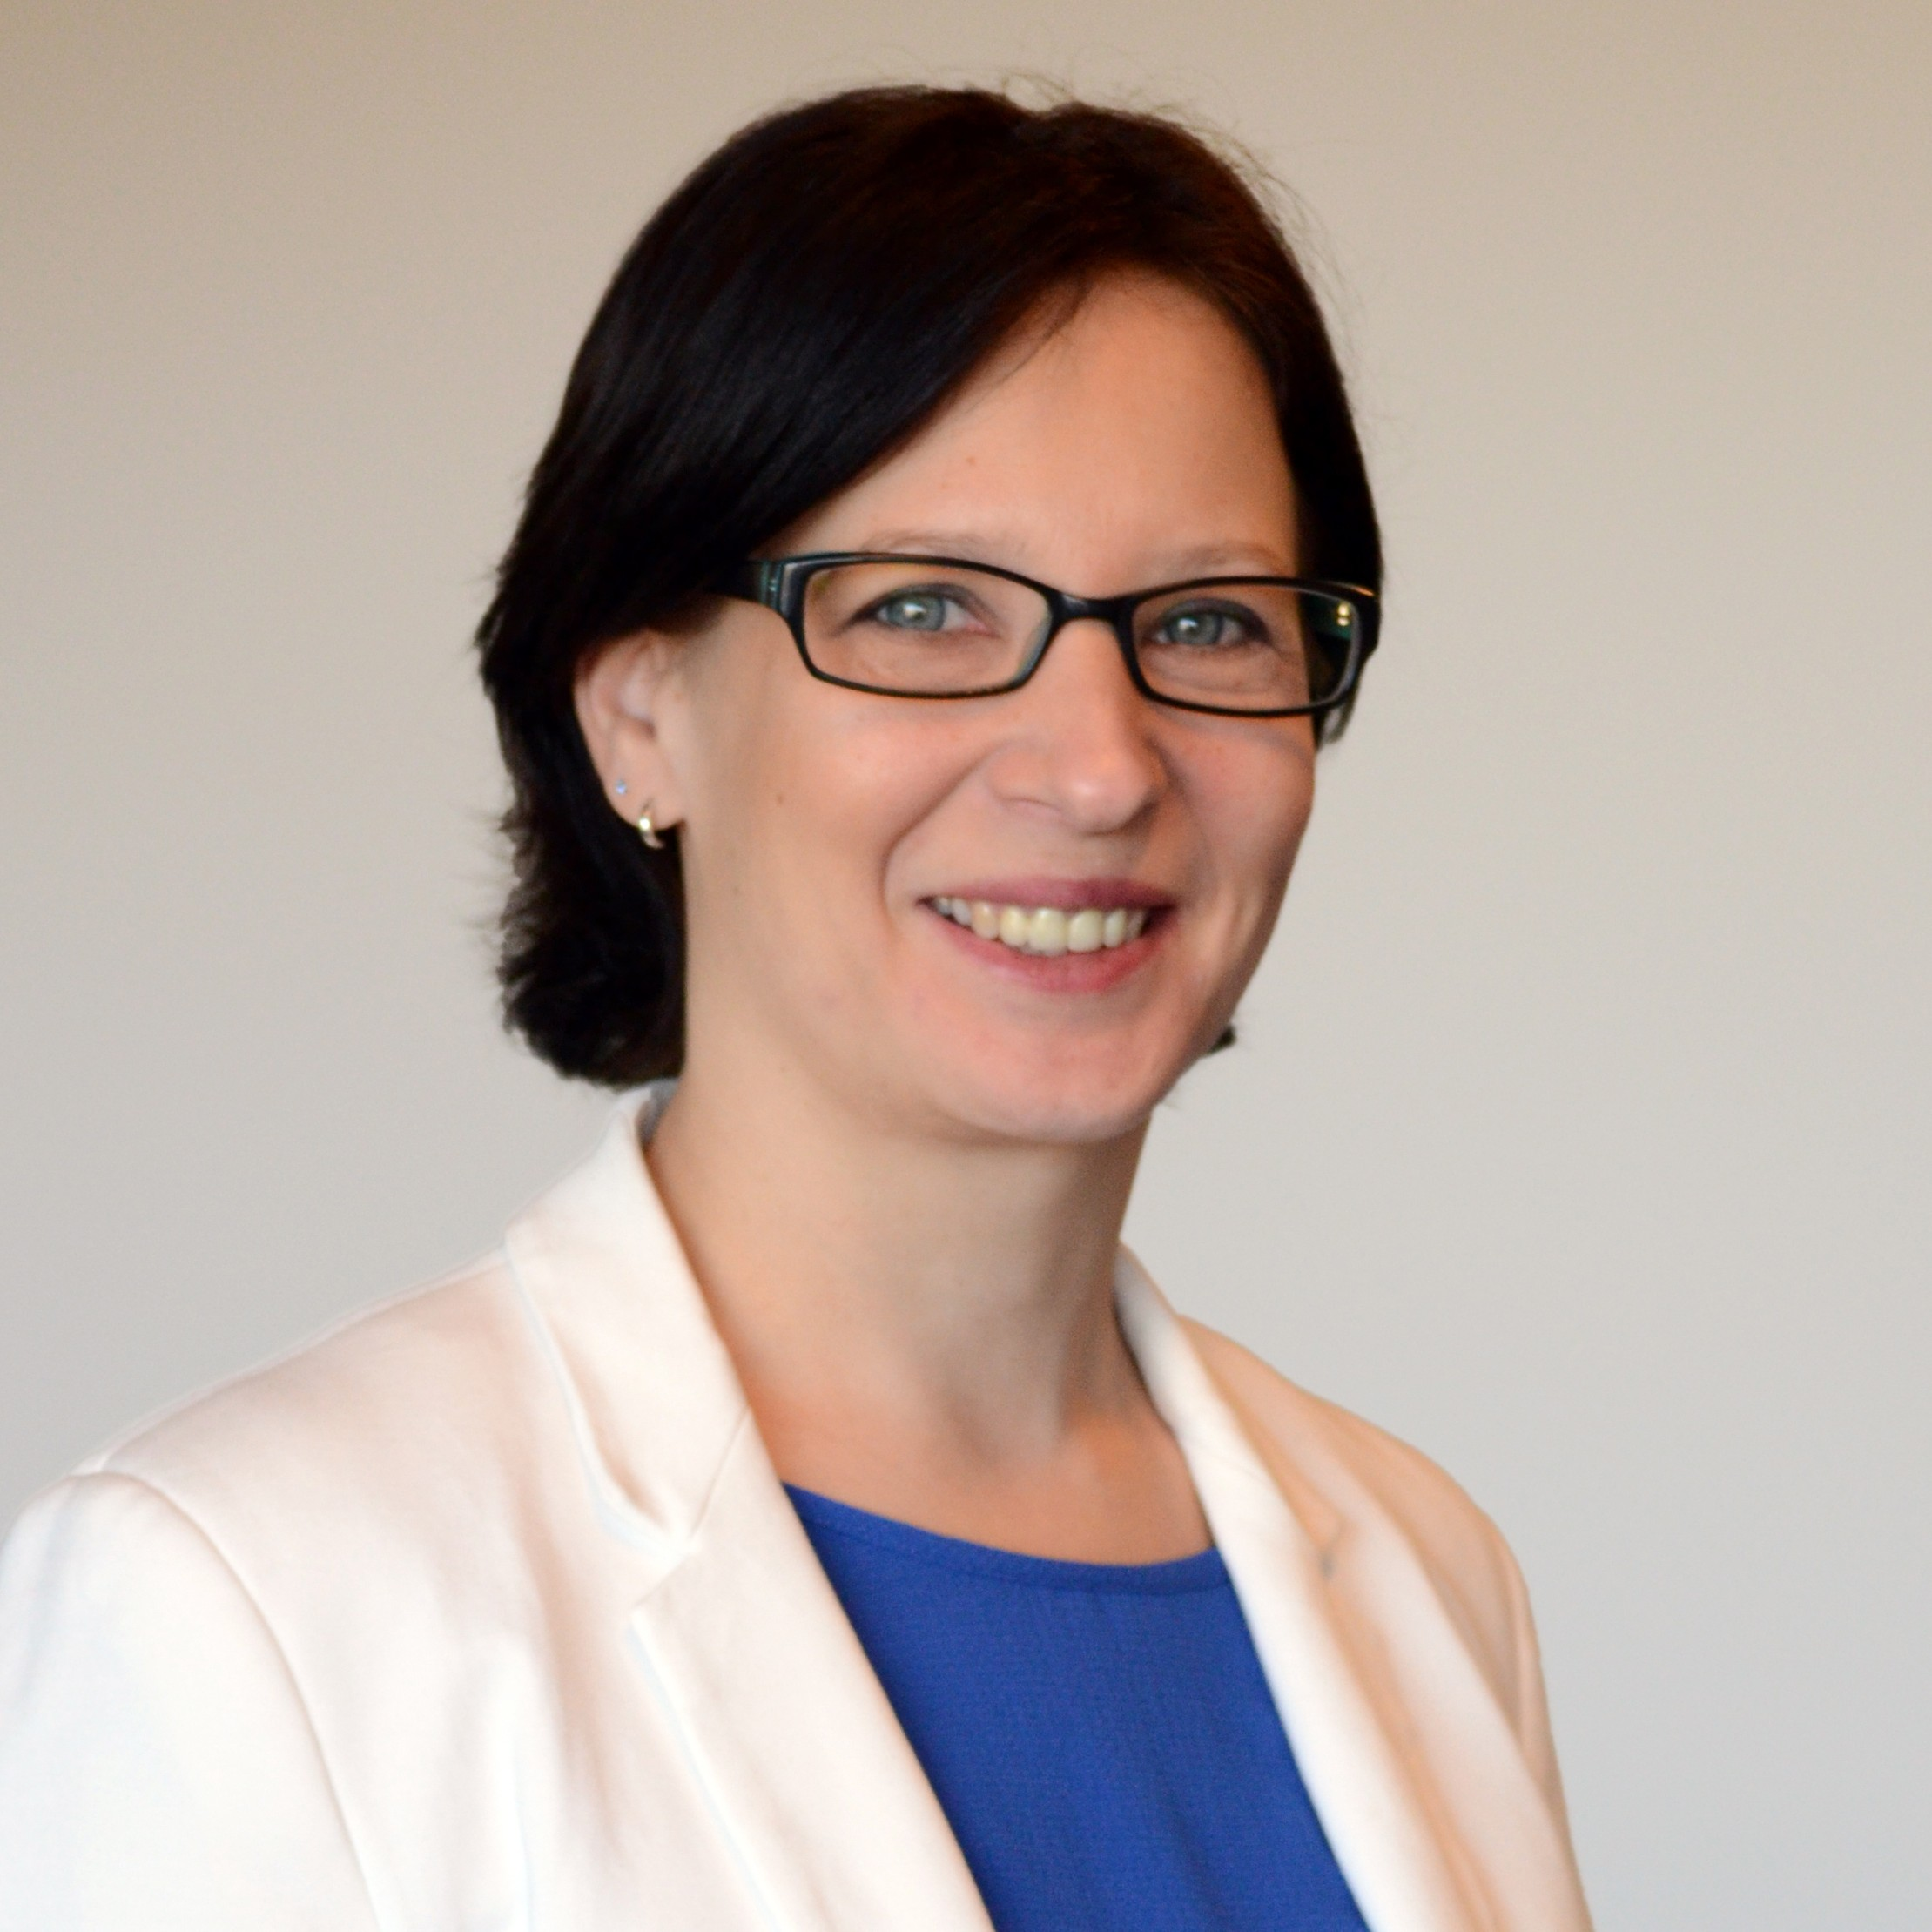 Silke Barkmann